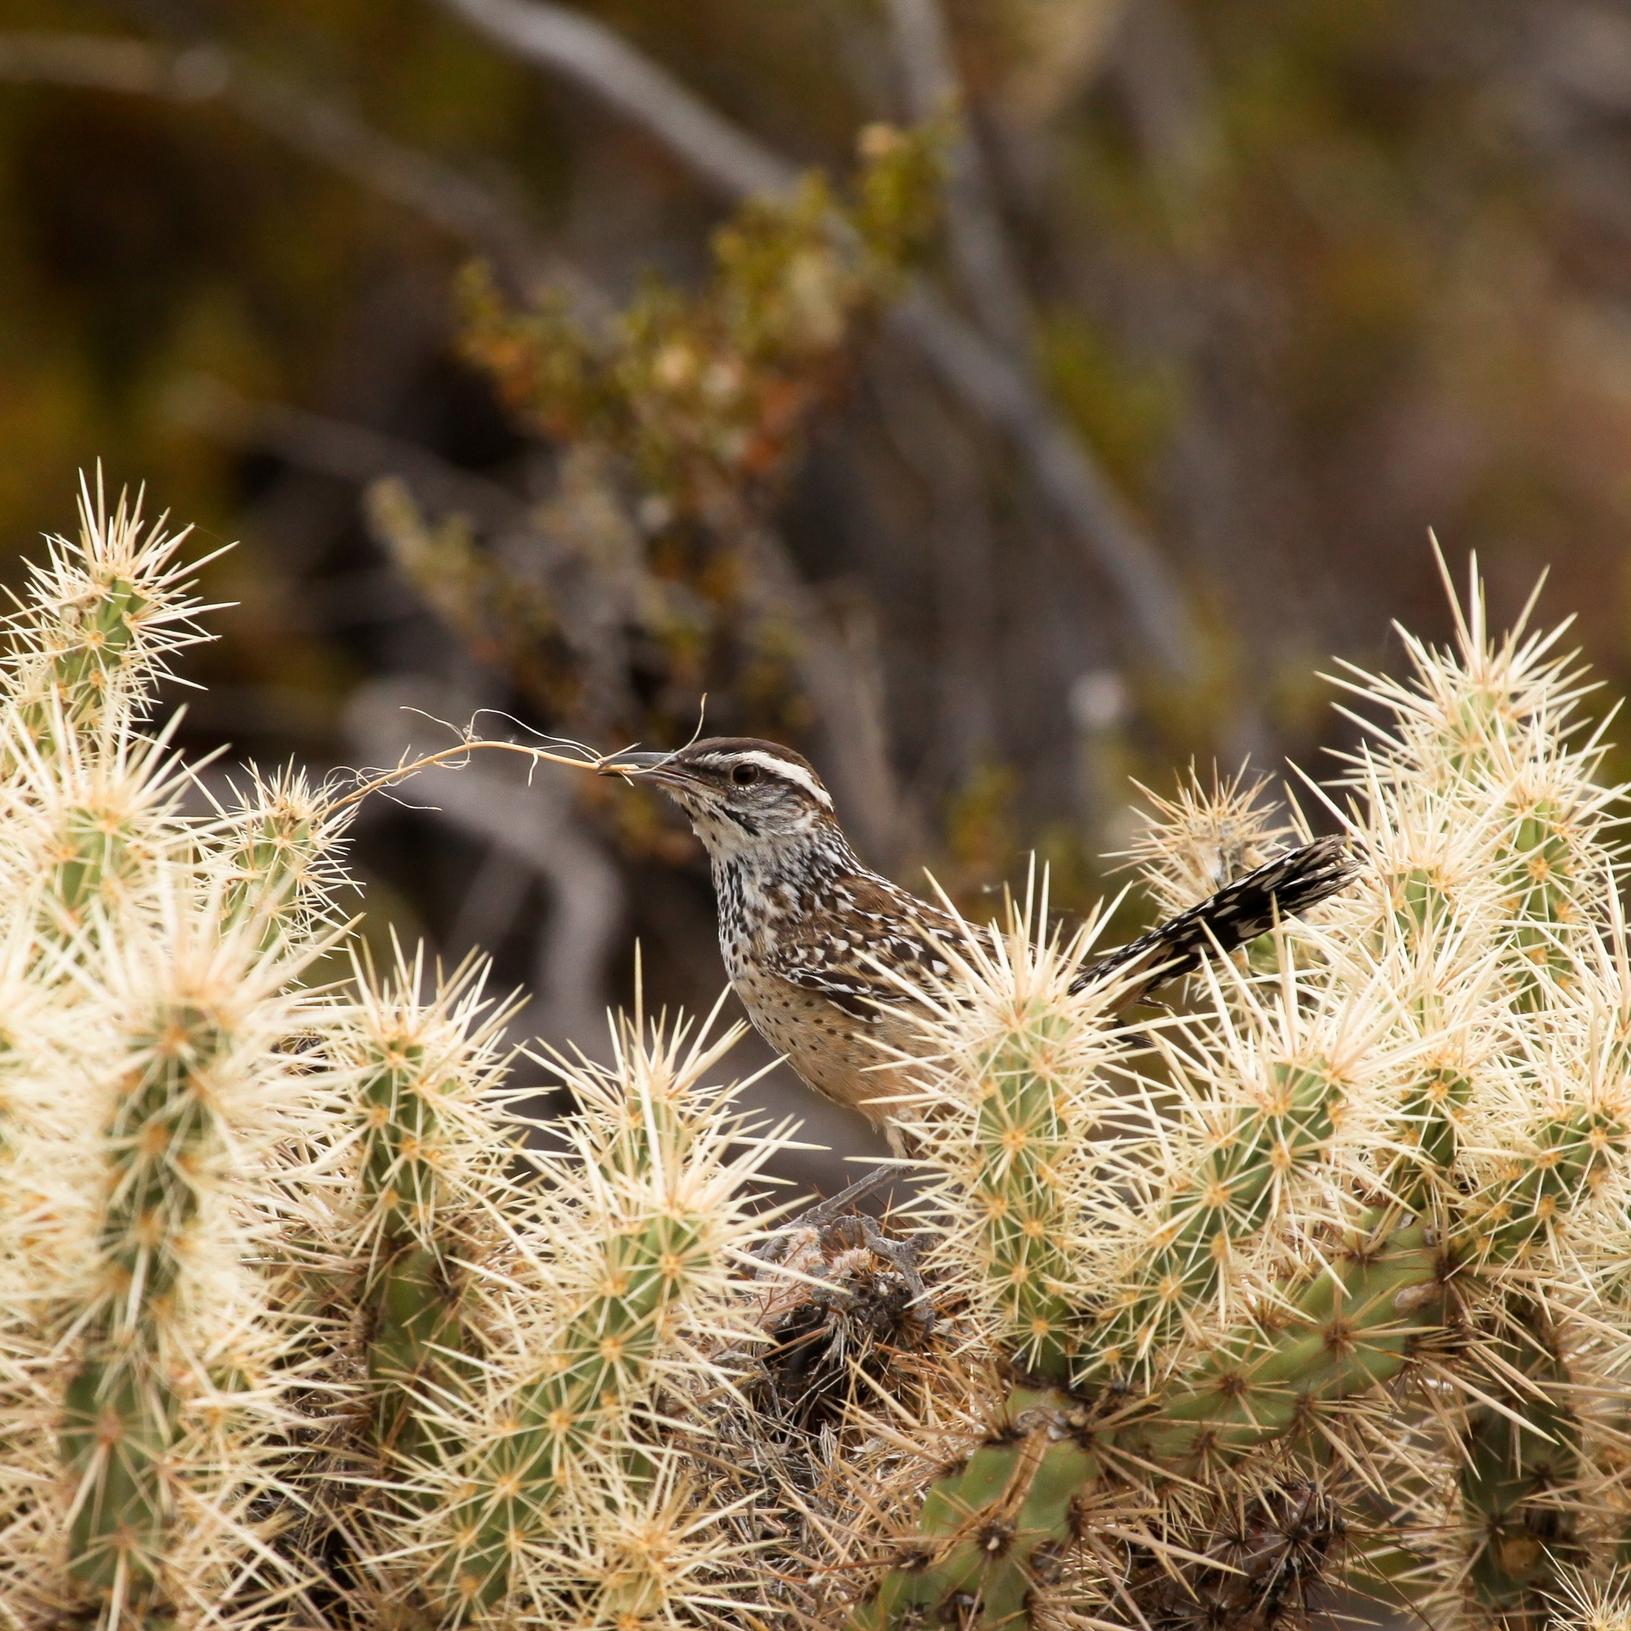 Cactus Wren / Photo: Amy Leist